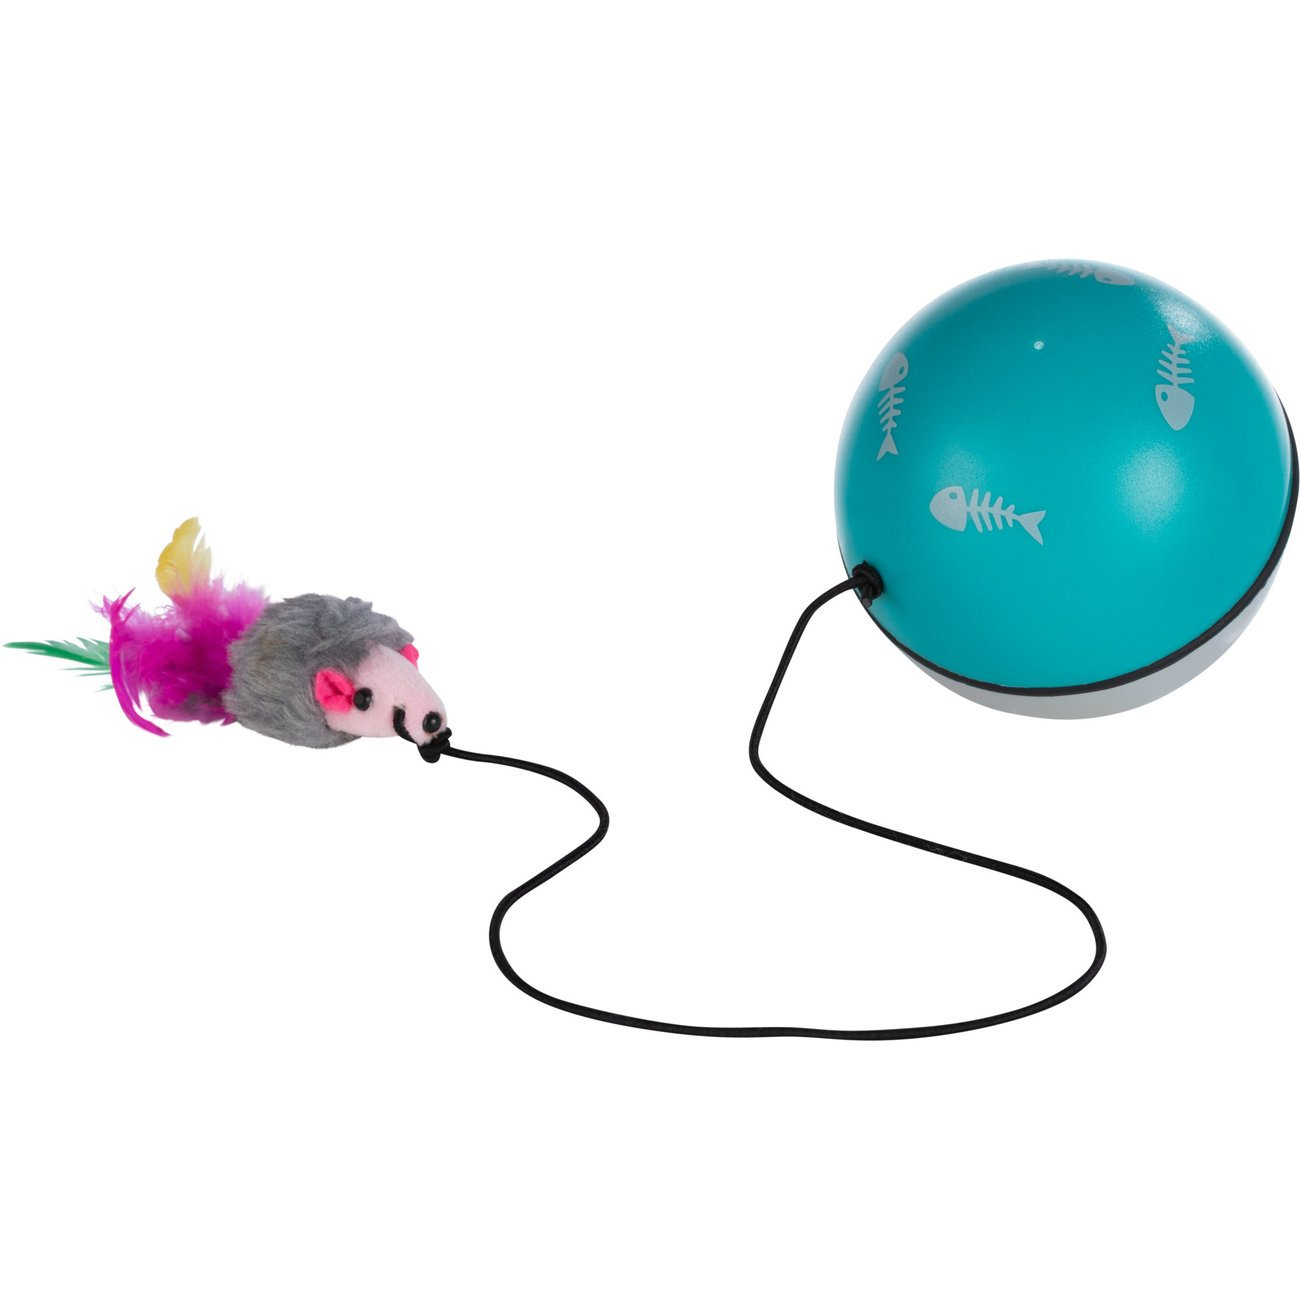 TRIXIE Katzenball Turbinio mit Motor und Maus 4564, Bild 2